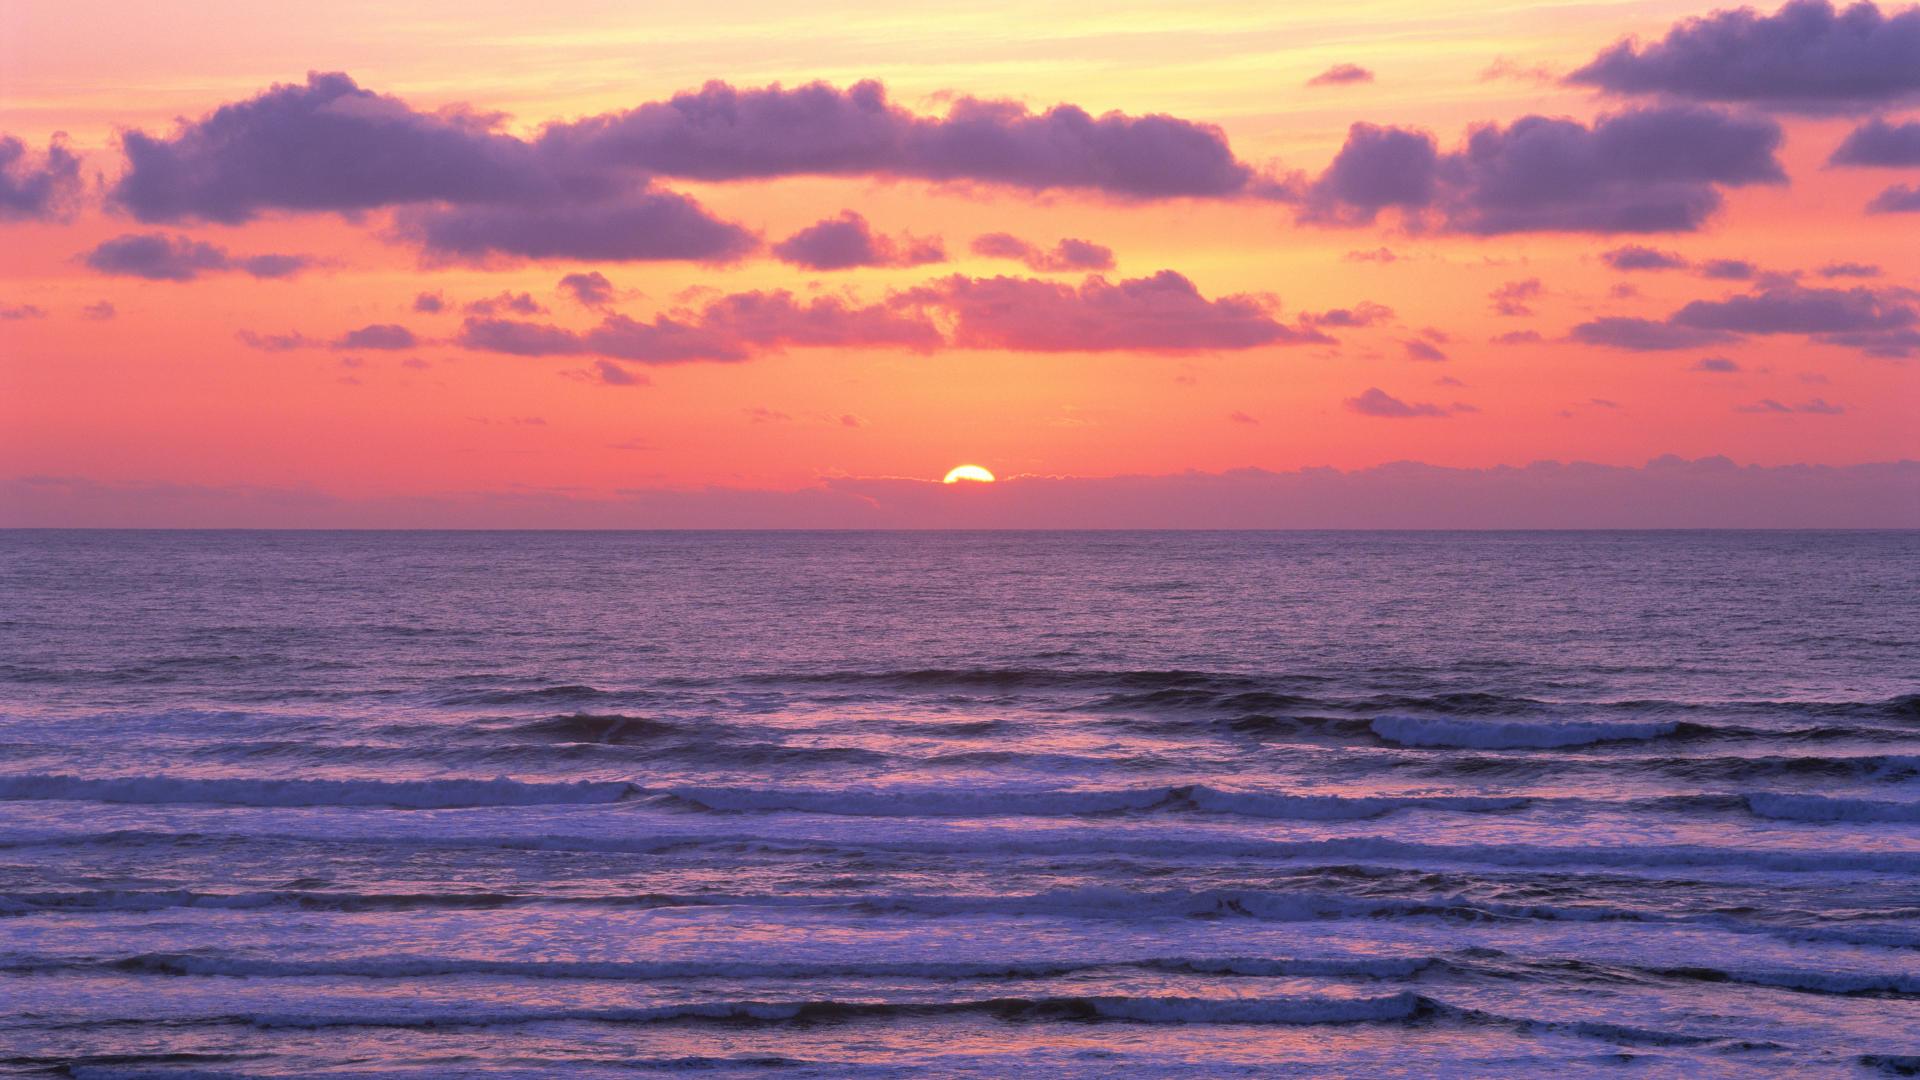 Res: 1920x1080, Ocean Sunset Wallpaper Tumblr 2